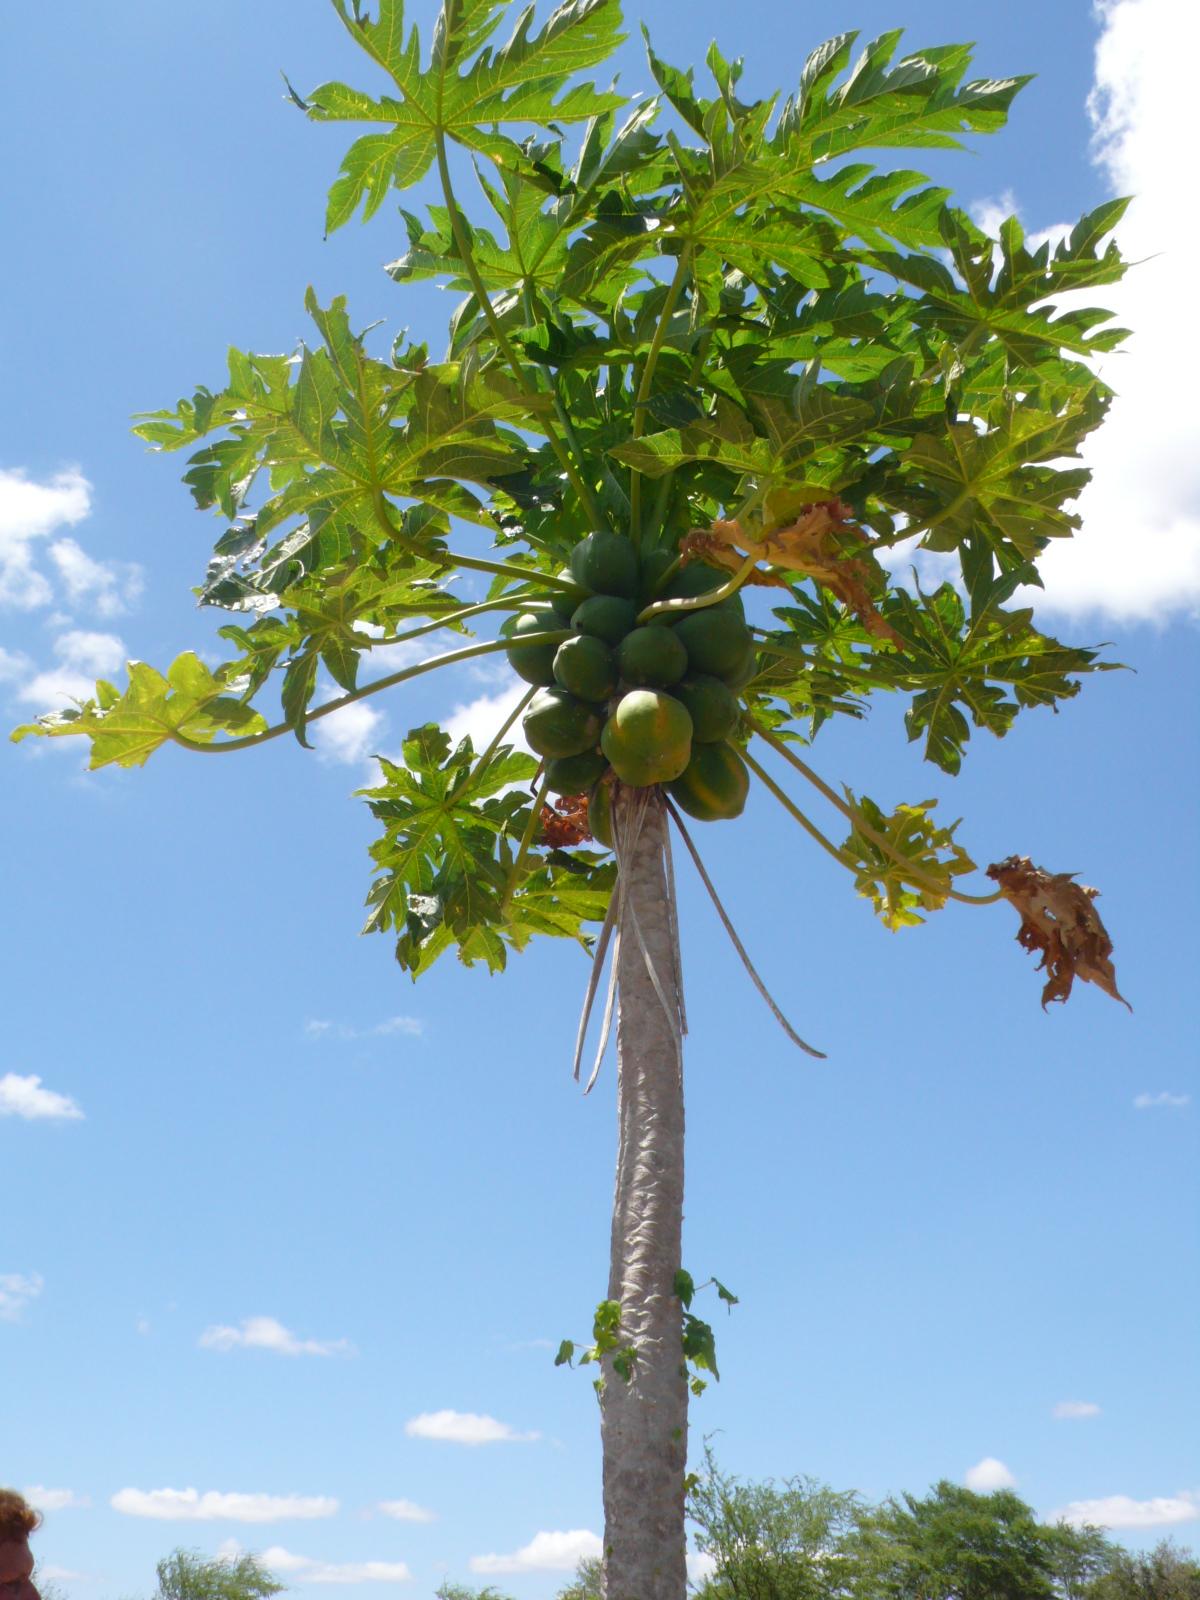 10 exotic fruits and vegetables to grow papaya purple tomatoes malaysian eggplant pineberries